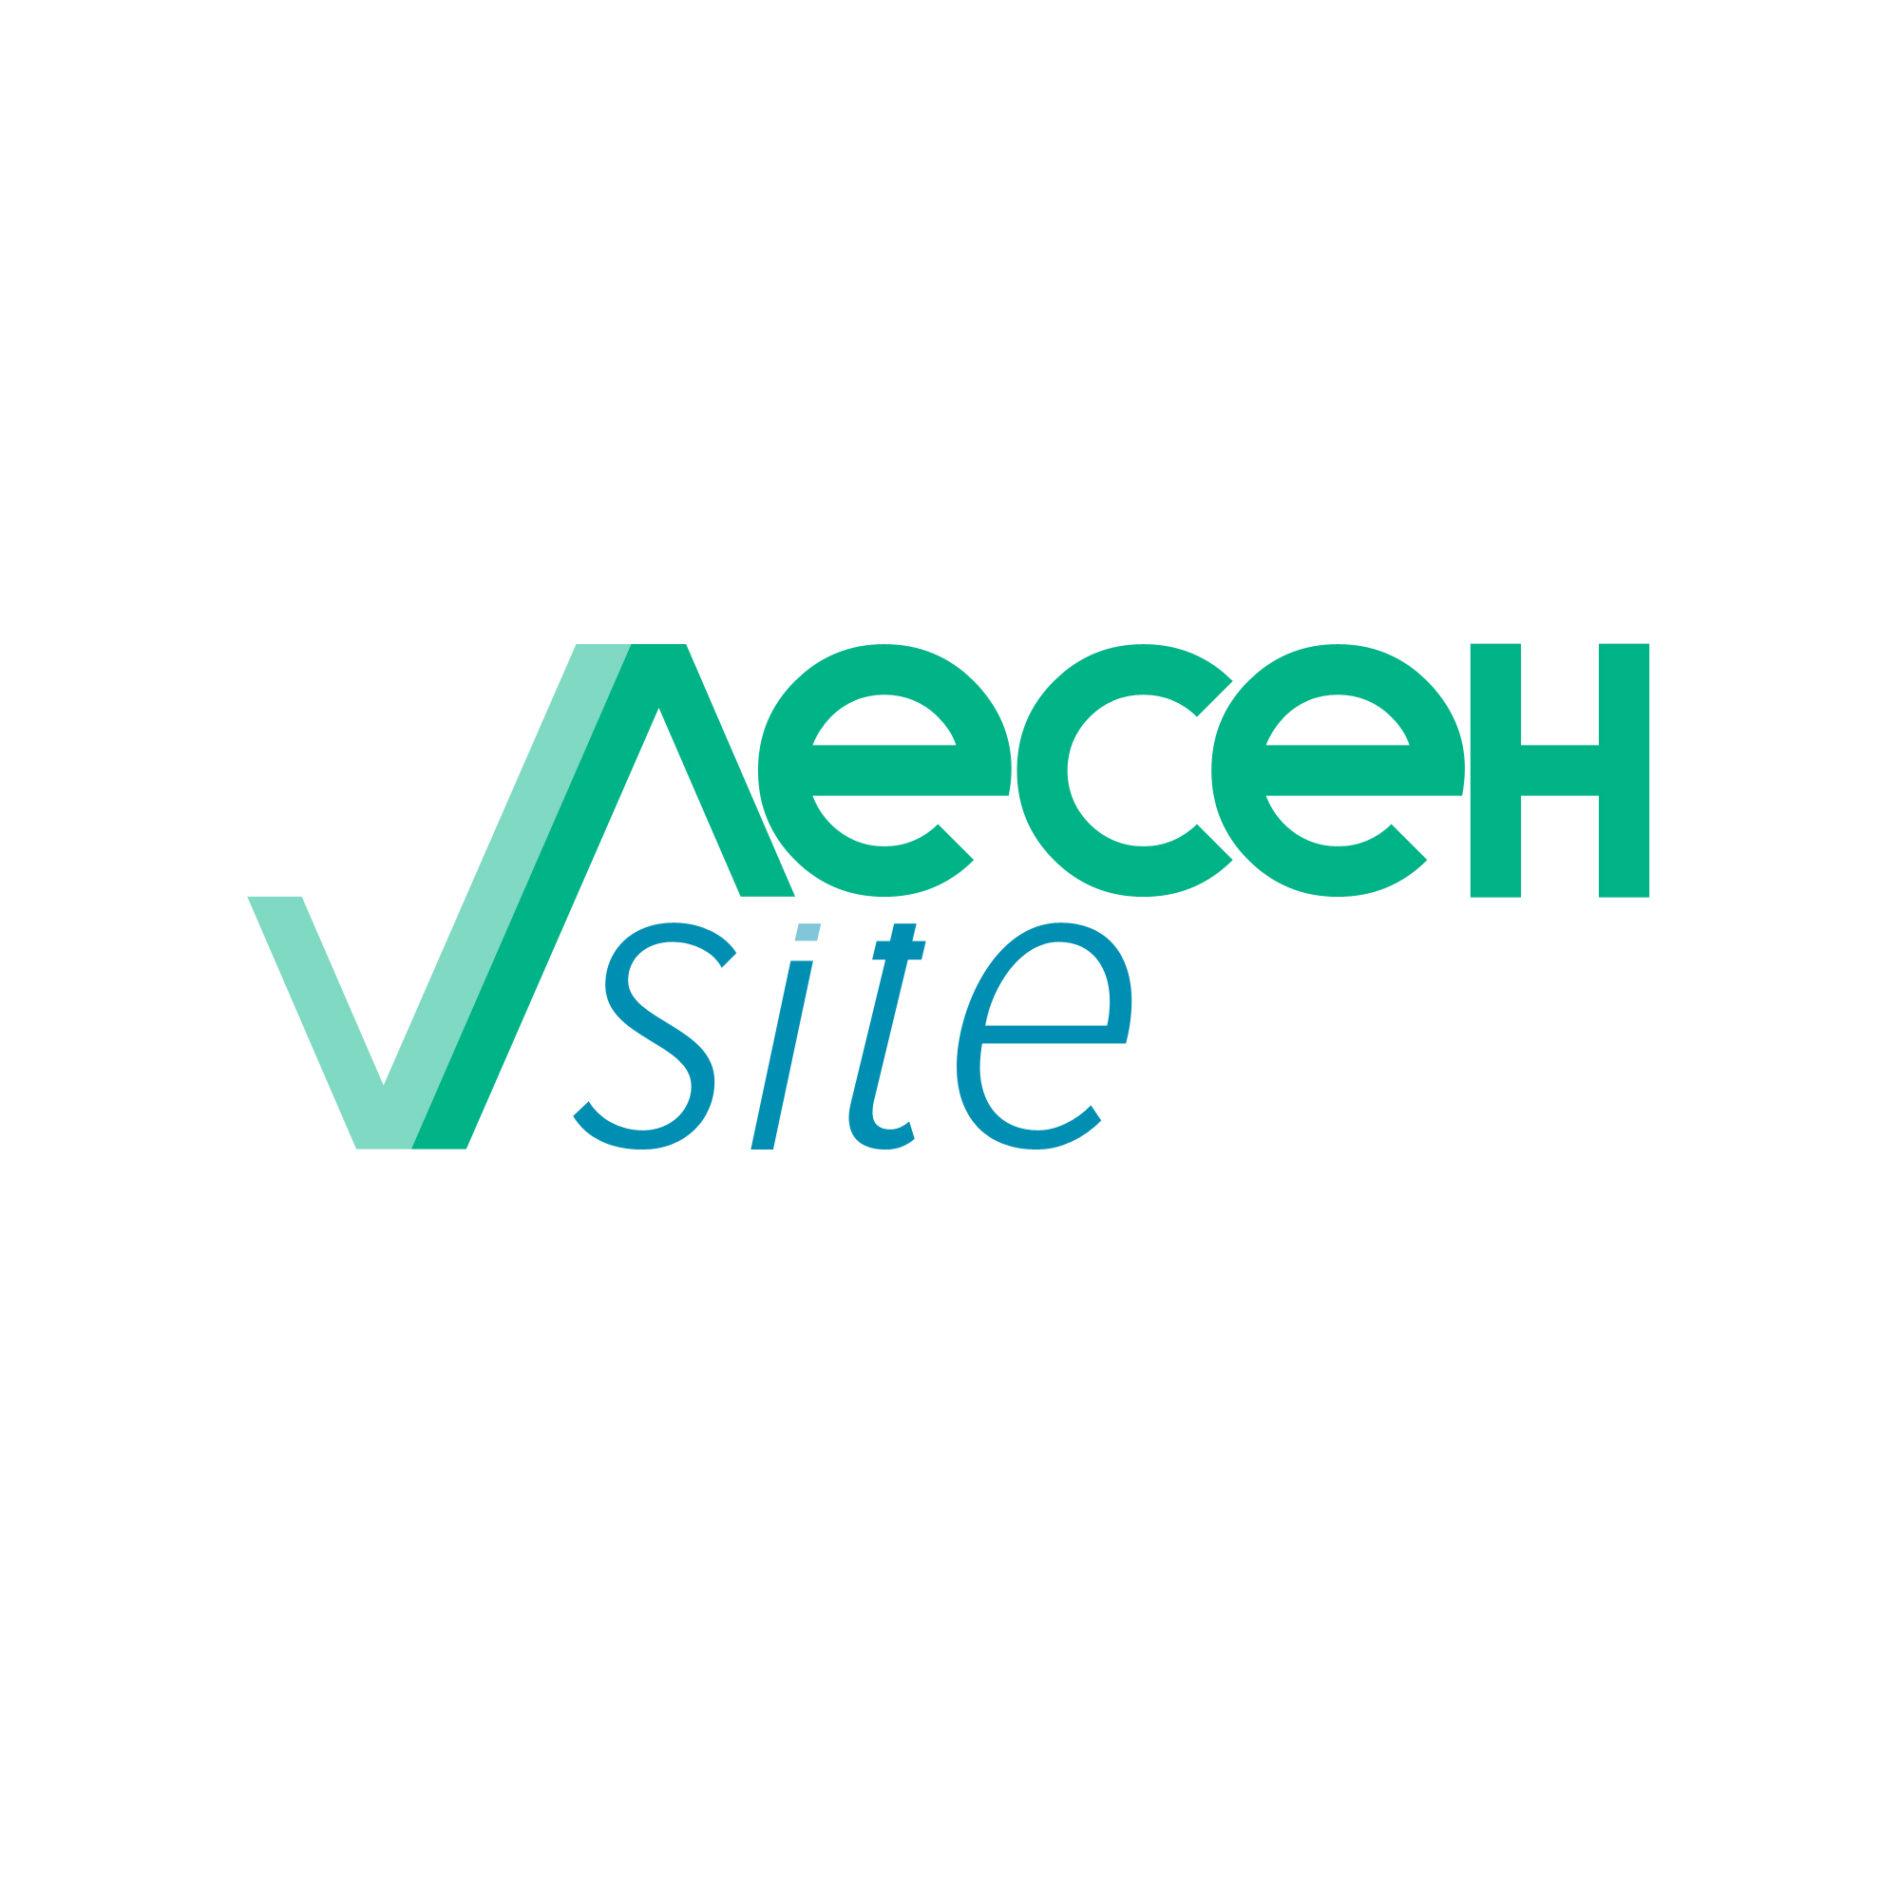 lesen.site logo